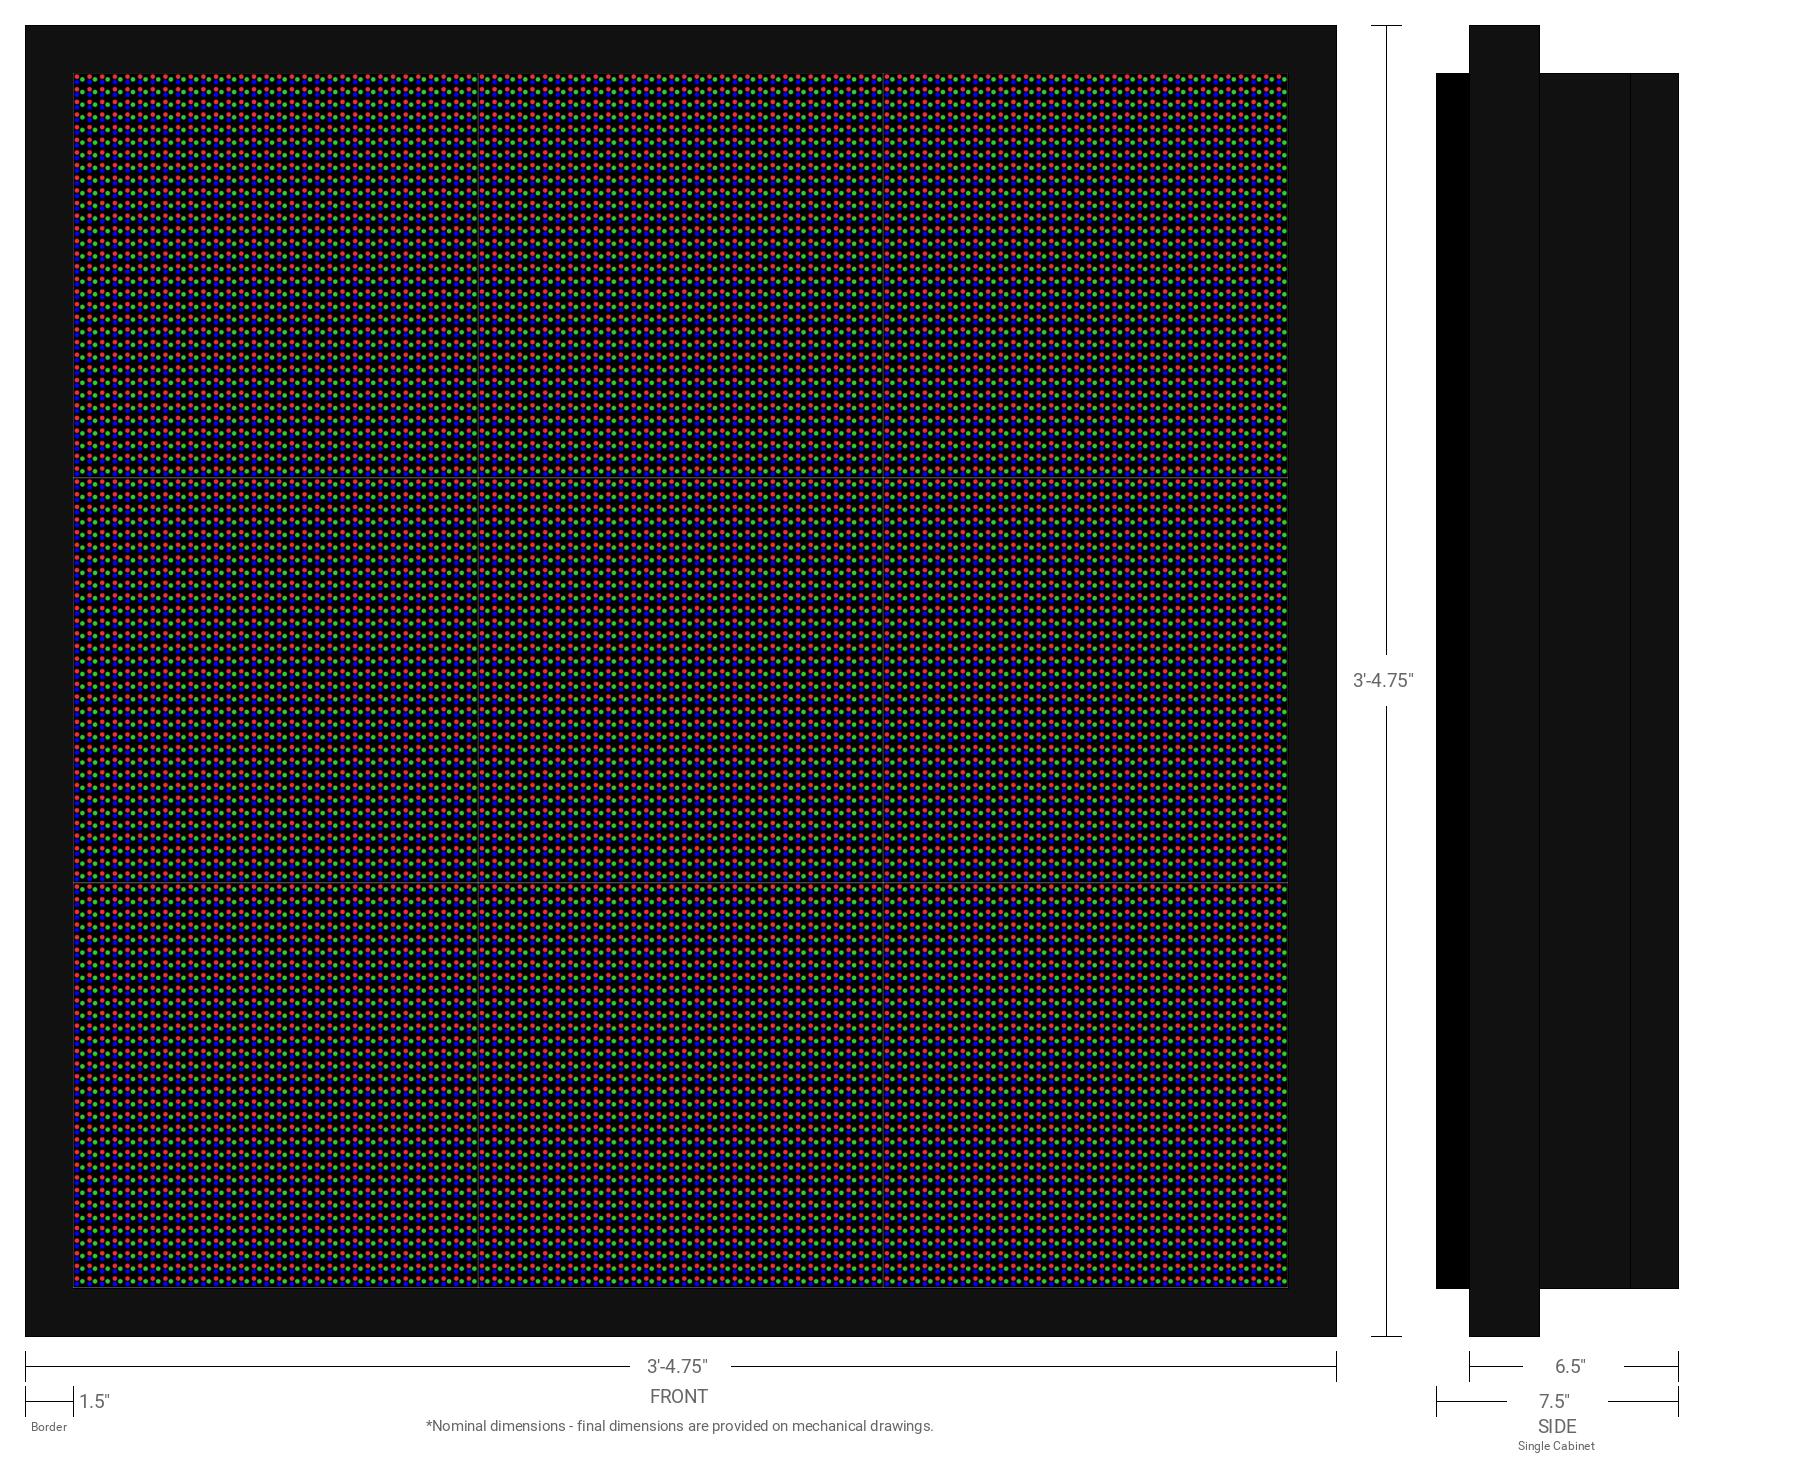 Aurora 10mm 96x96 Single Sided Full Color LED Display